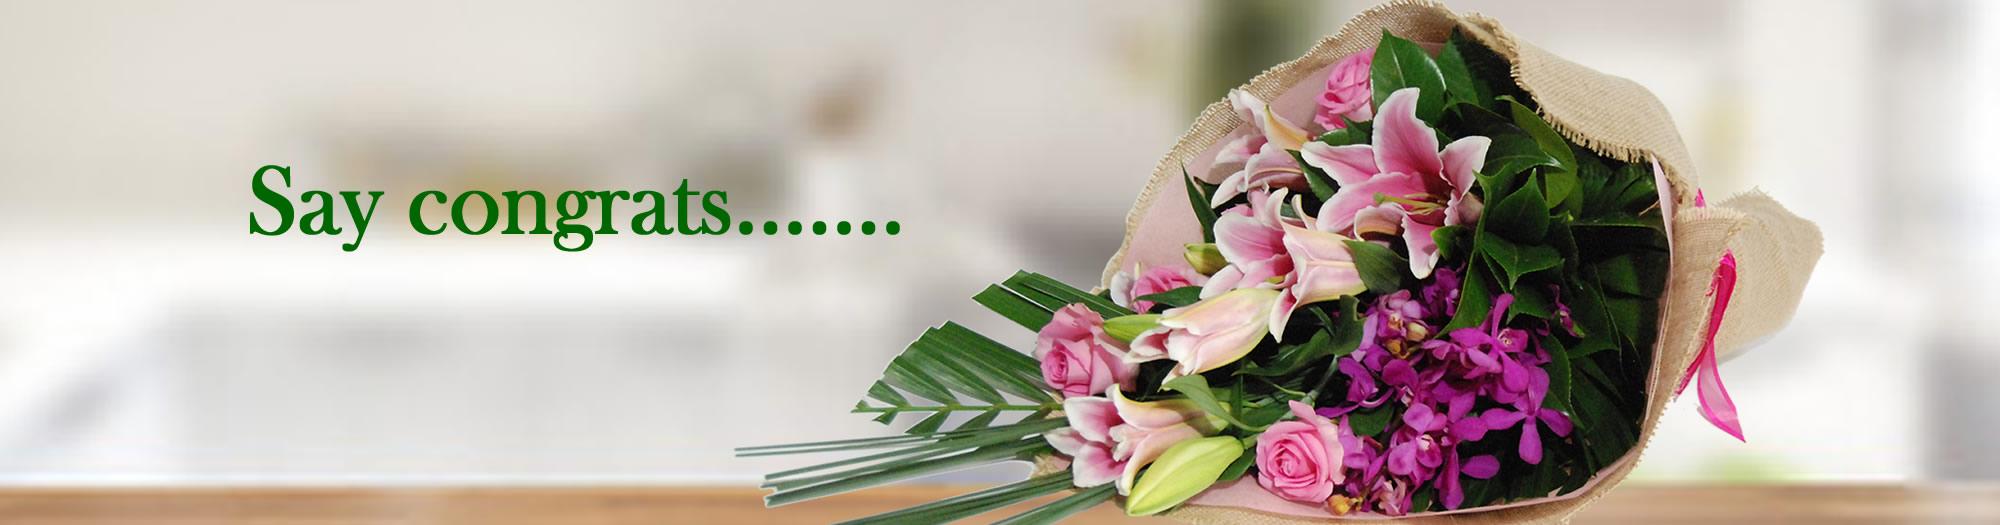 Angkor flowers- congratulation